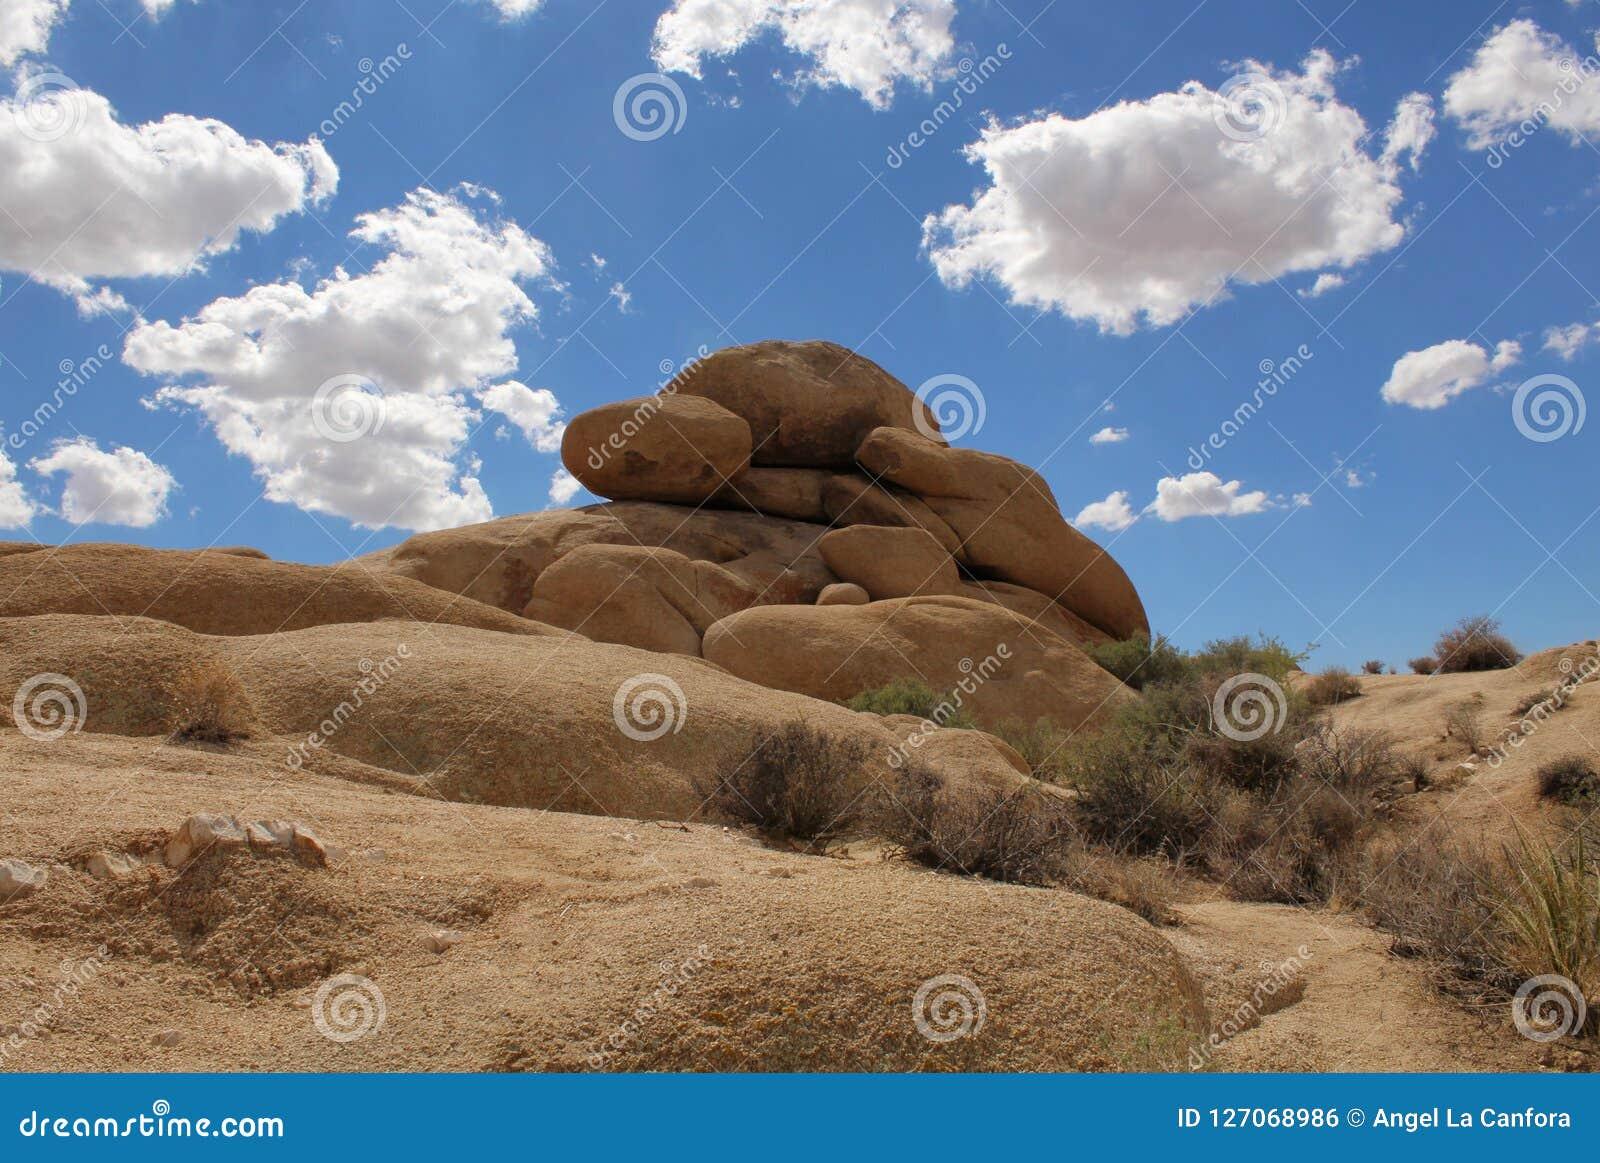 Boulders At Jumbo Rocks Campground Joshua Tree National